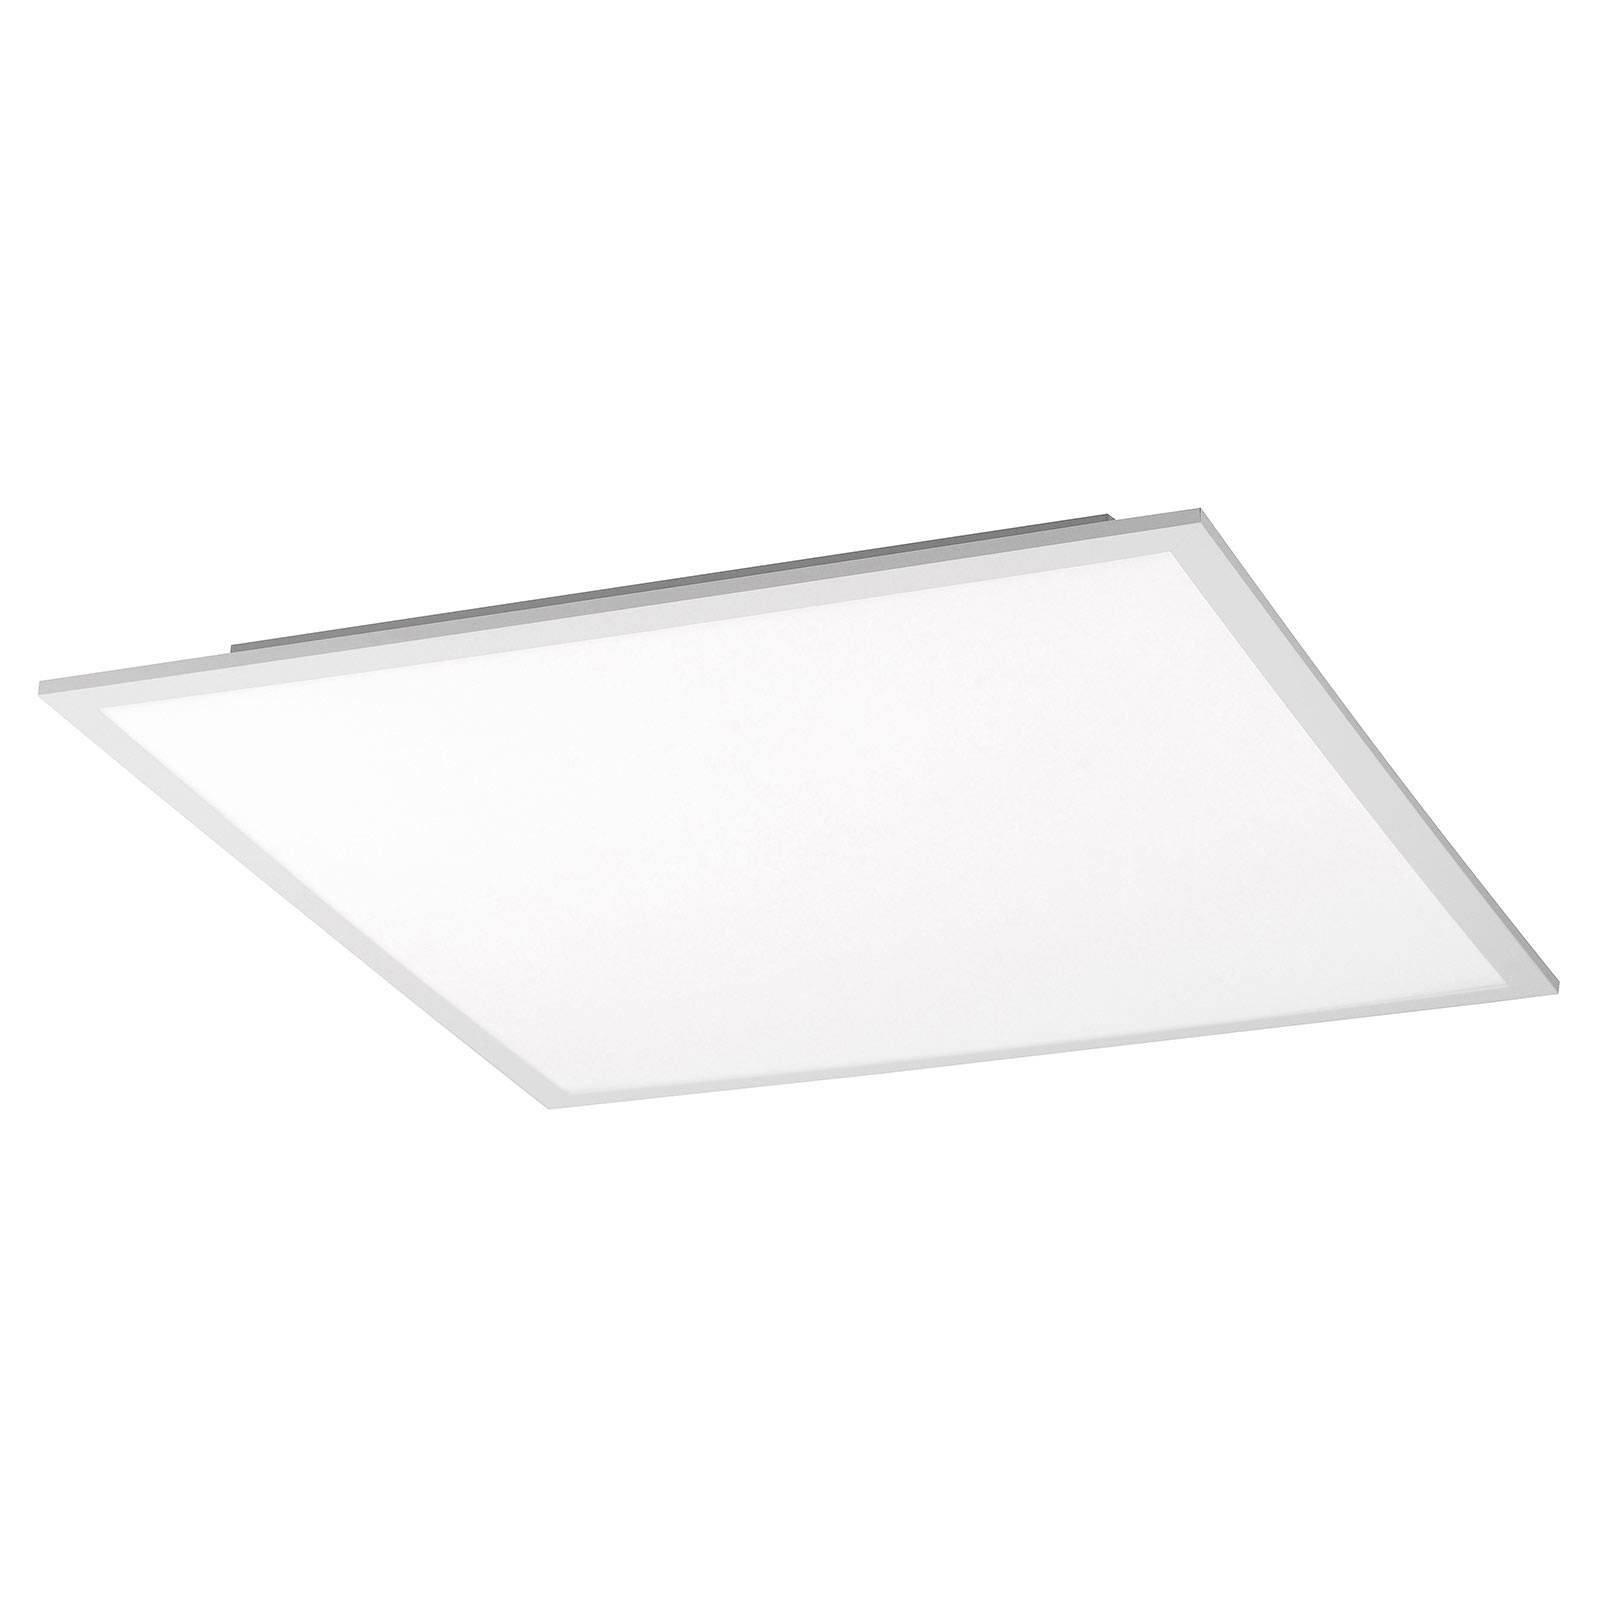 LOLAsmart Flat LED-taklampe, 45 x 45 cm